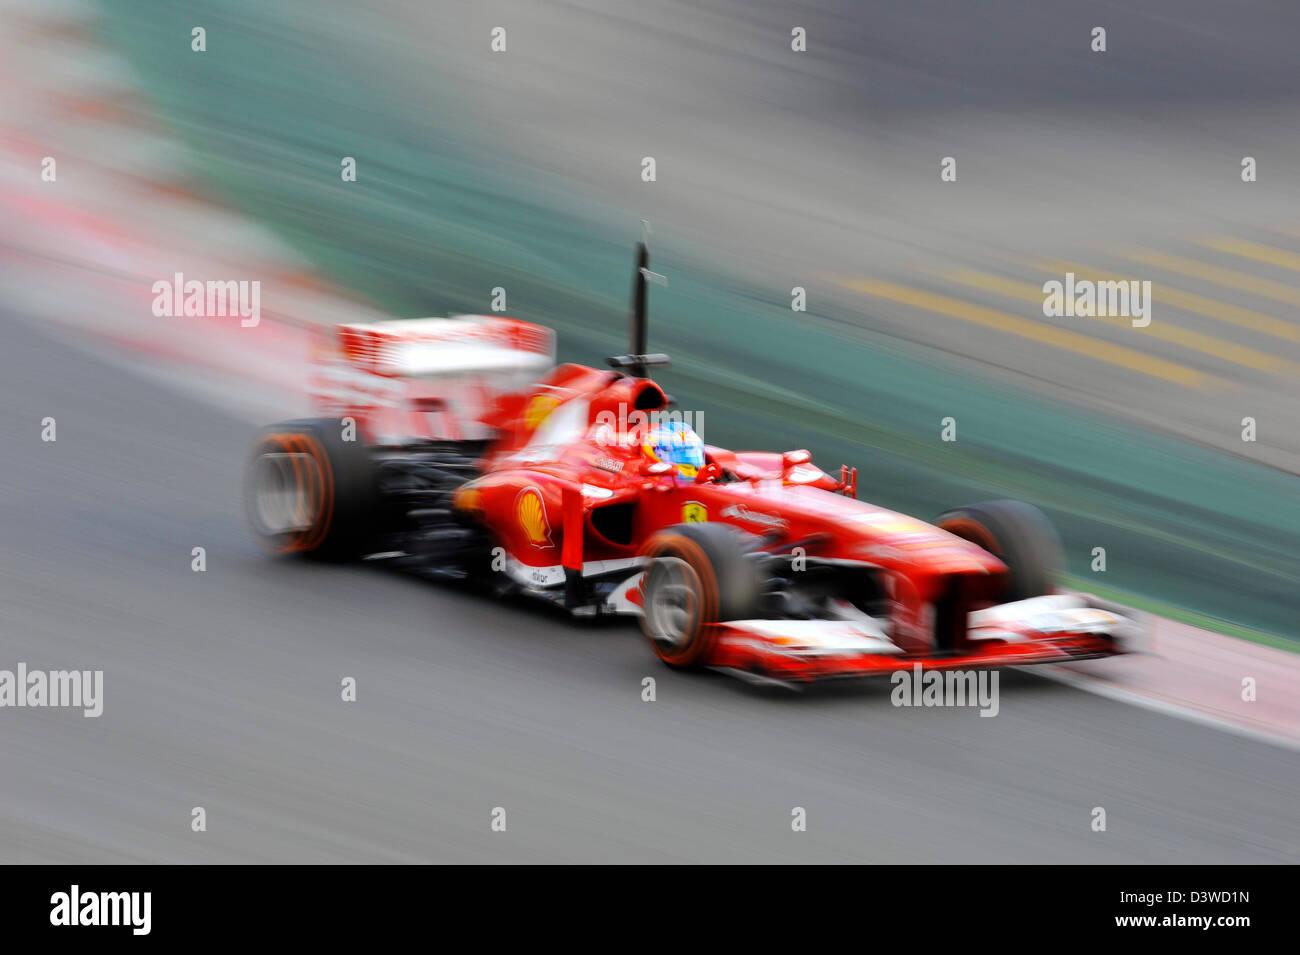 Fernando Alonso (ESP), Ferrari F138 during Formula One tests on Circuit de Catalunya racetrack near Barcelona, Spain - Stock Image